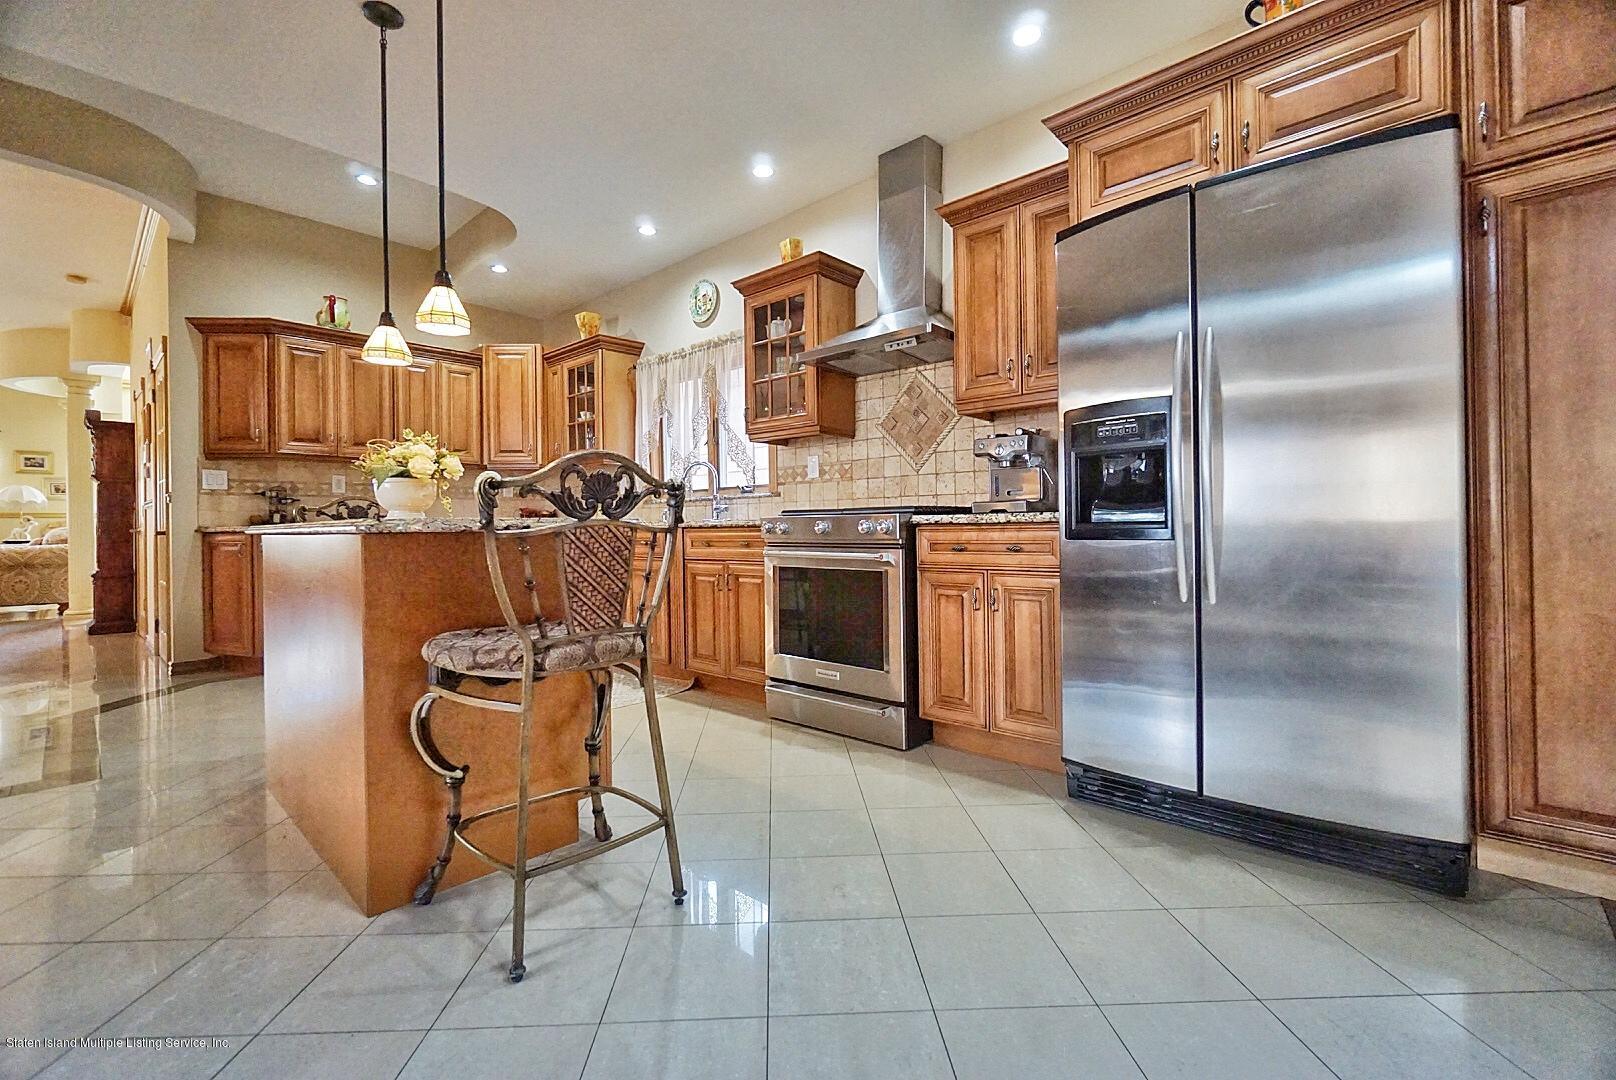 Single Family - Detached 67 Marvin Road  Staten Island, NY 10309, MLS-1128691-11